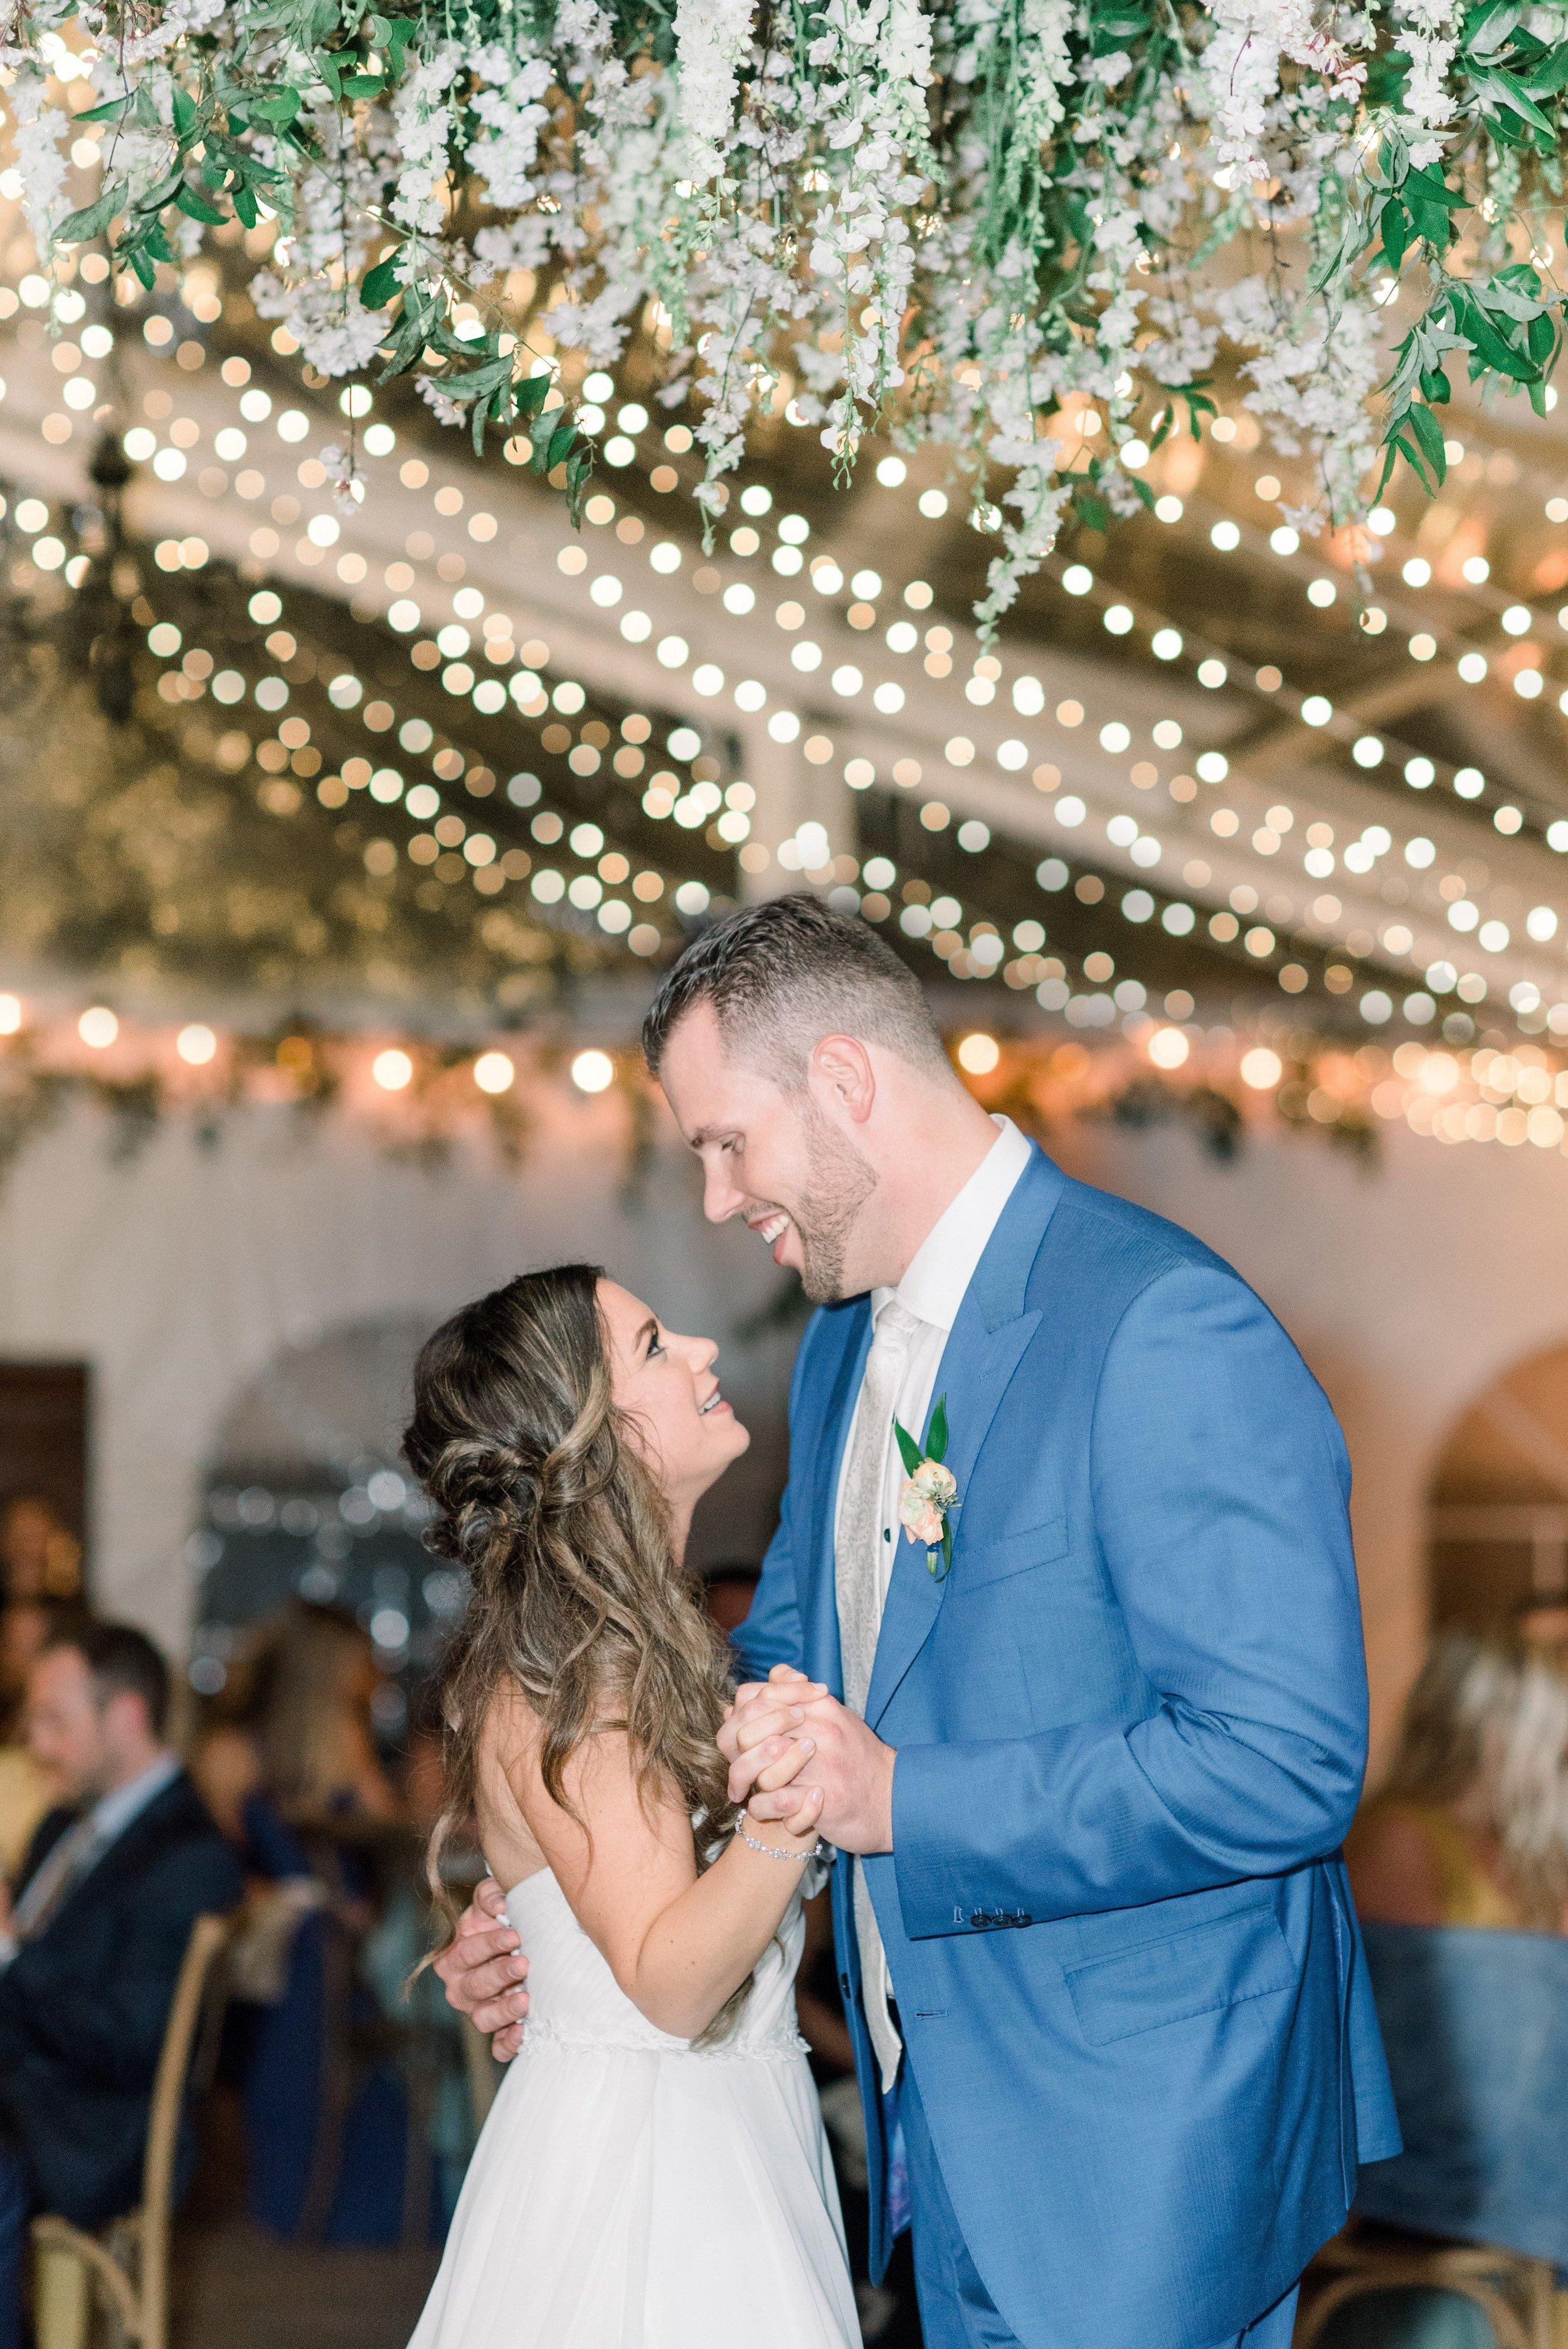 Inn at Fernbrook Wedding, Hanging Chandelier, Greenery Wedding, NJ Wedding, Tent Wedding, Tent Decor, Wedding Flowers, Muted Wedding, Cassi Claire Photography